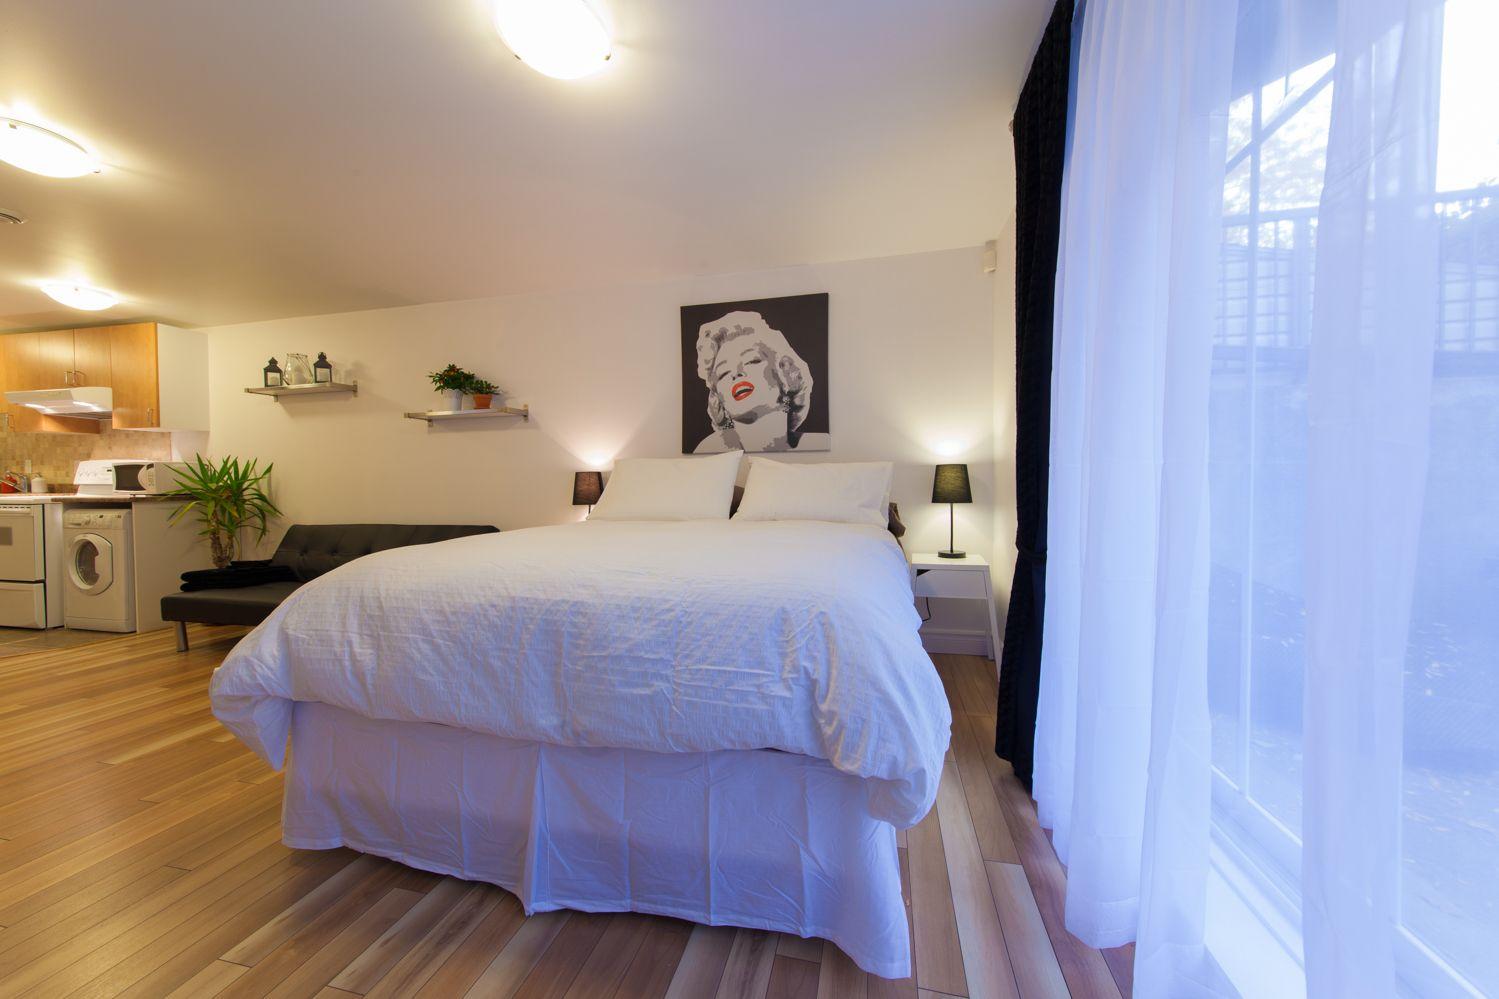 Studio louer pour courte ou longue p riode montr al for Studio meuble a montreal